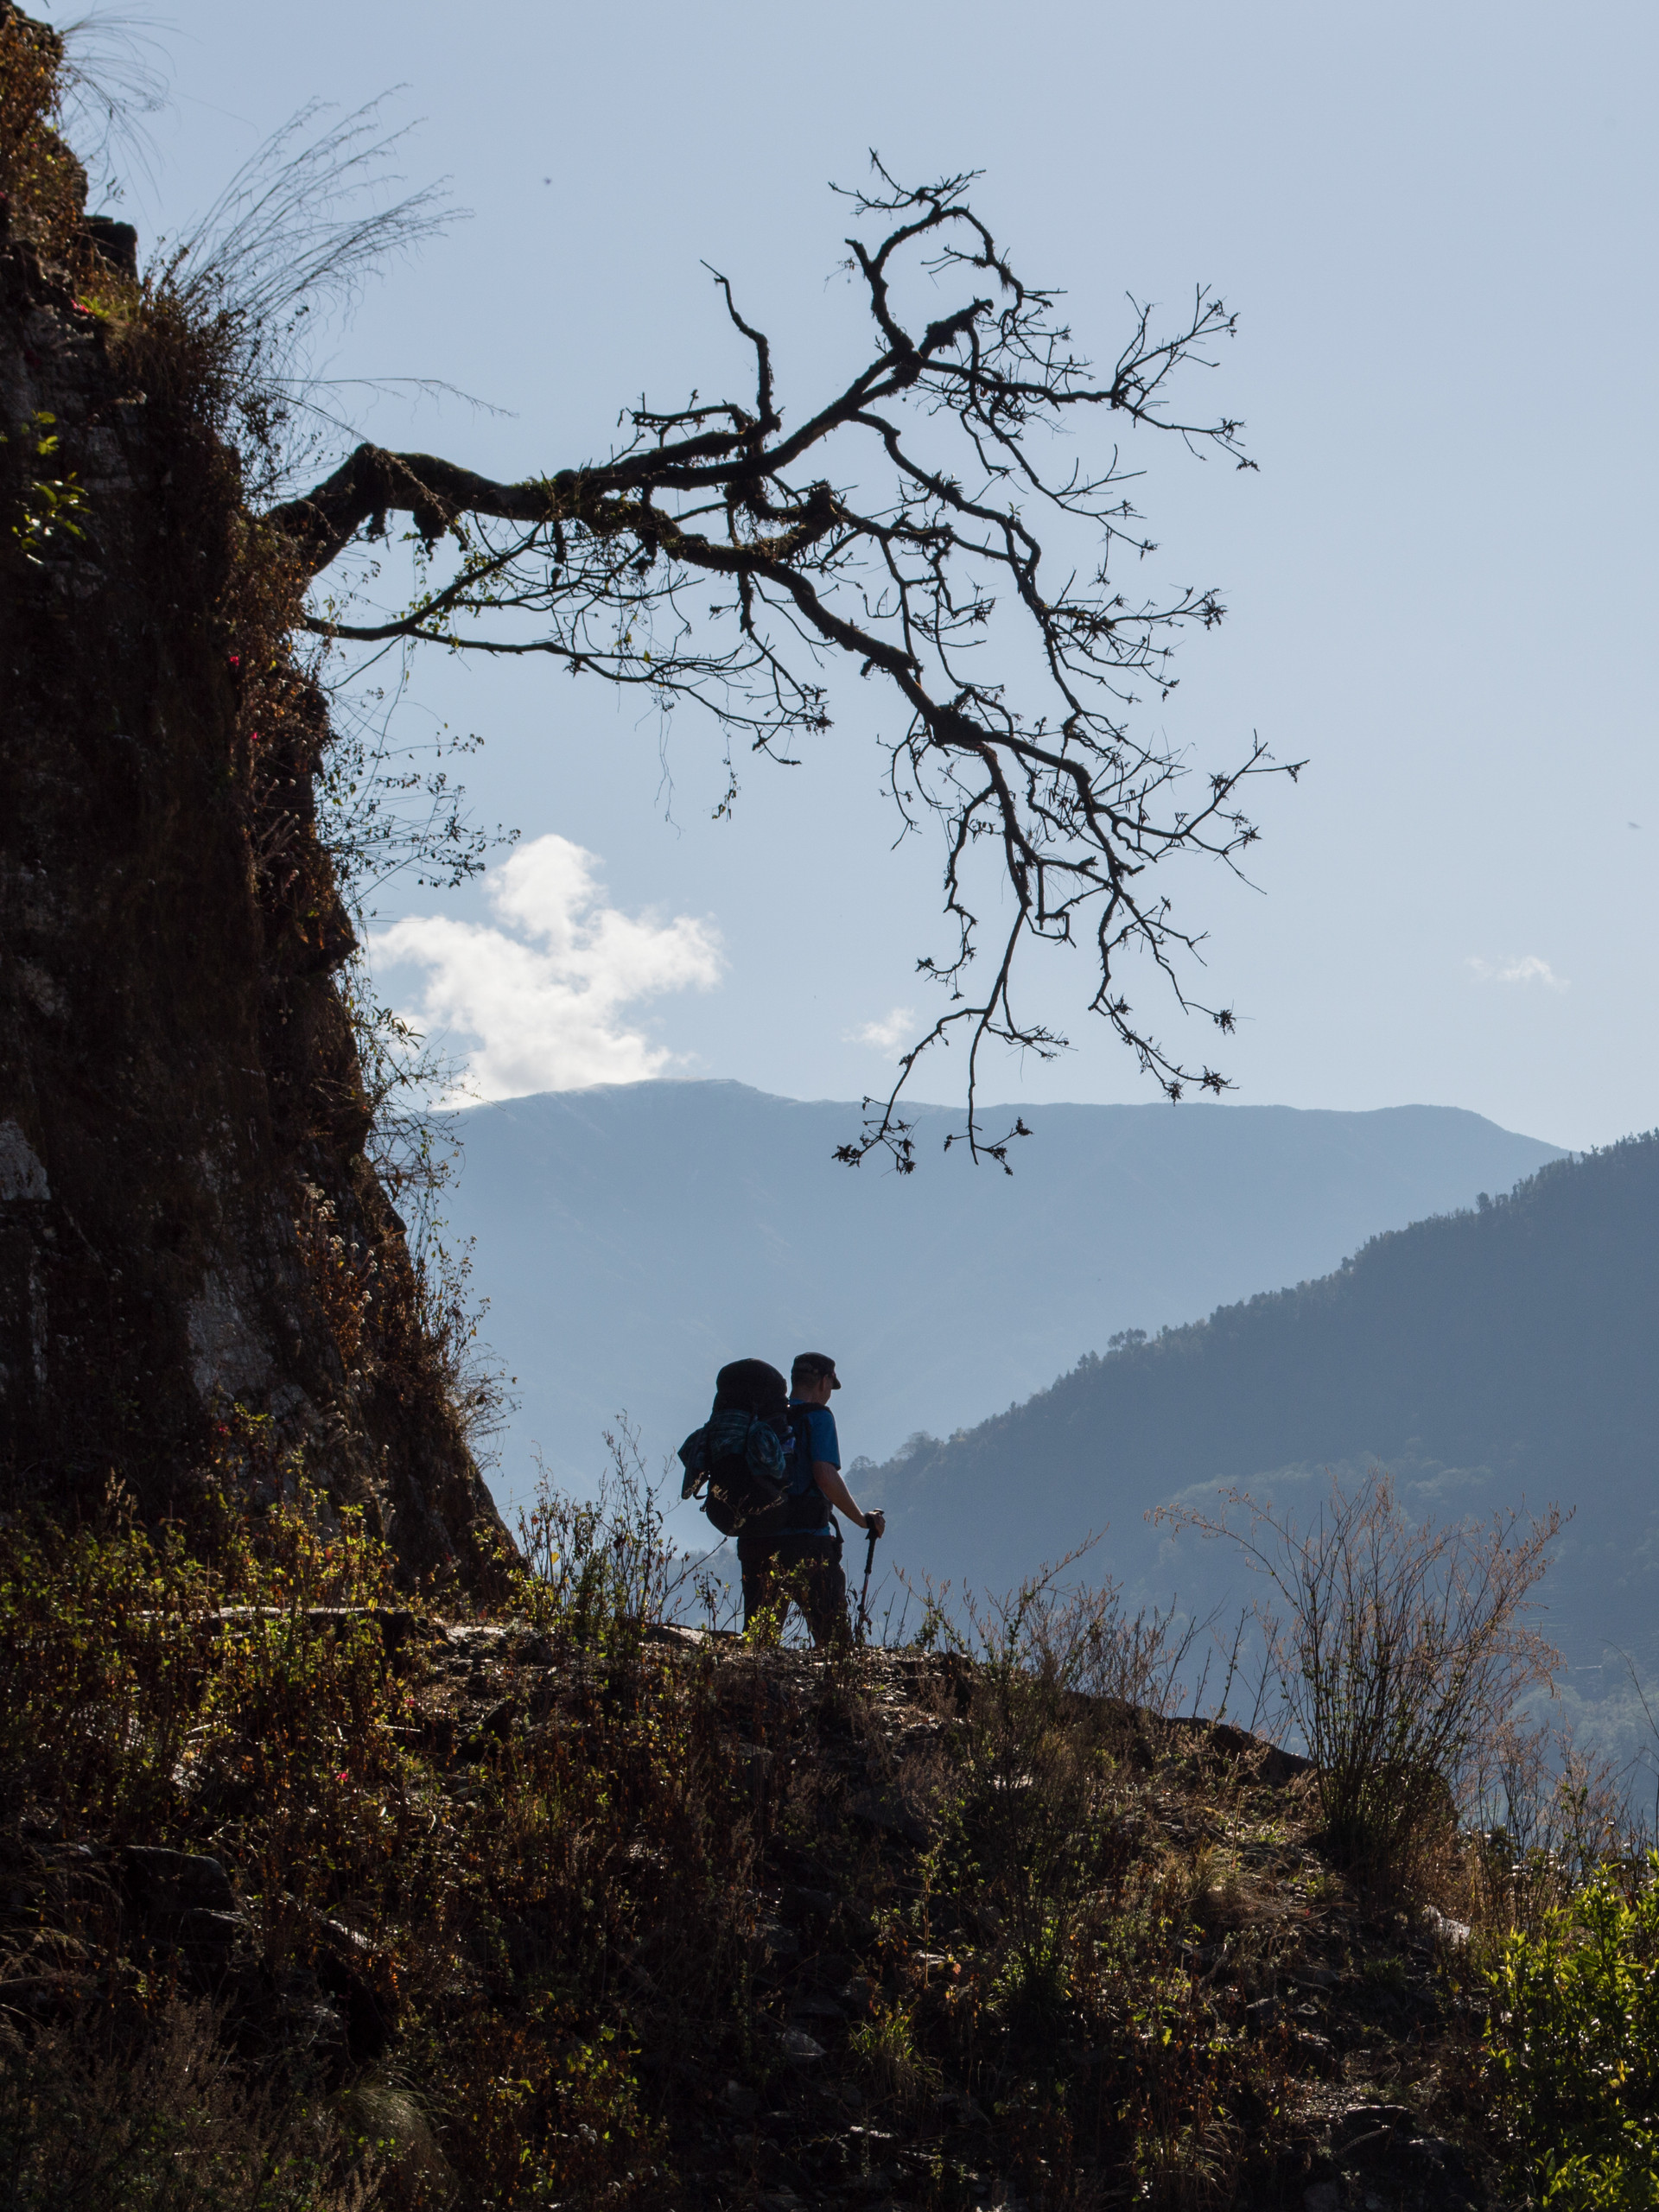 Kinja, Himalayas / Nepal · 2015